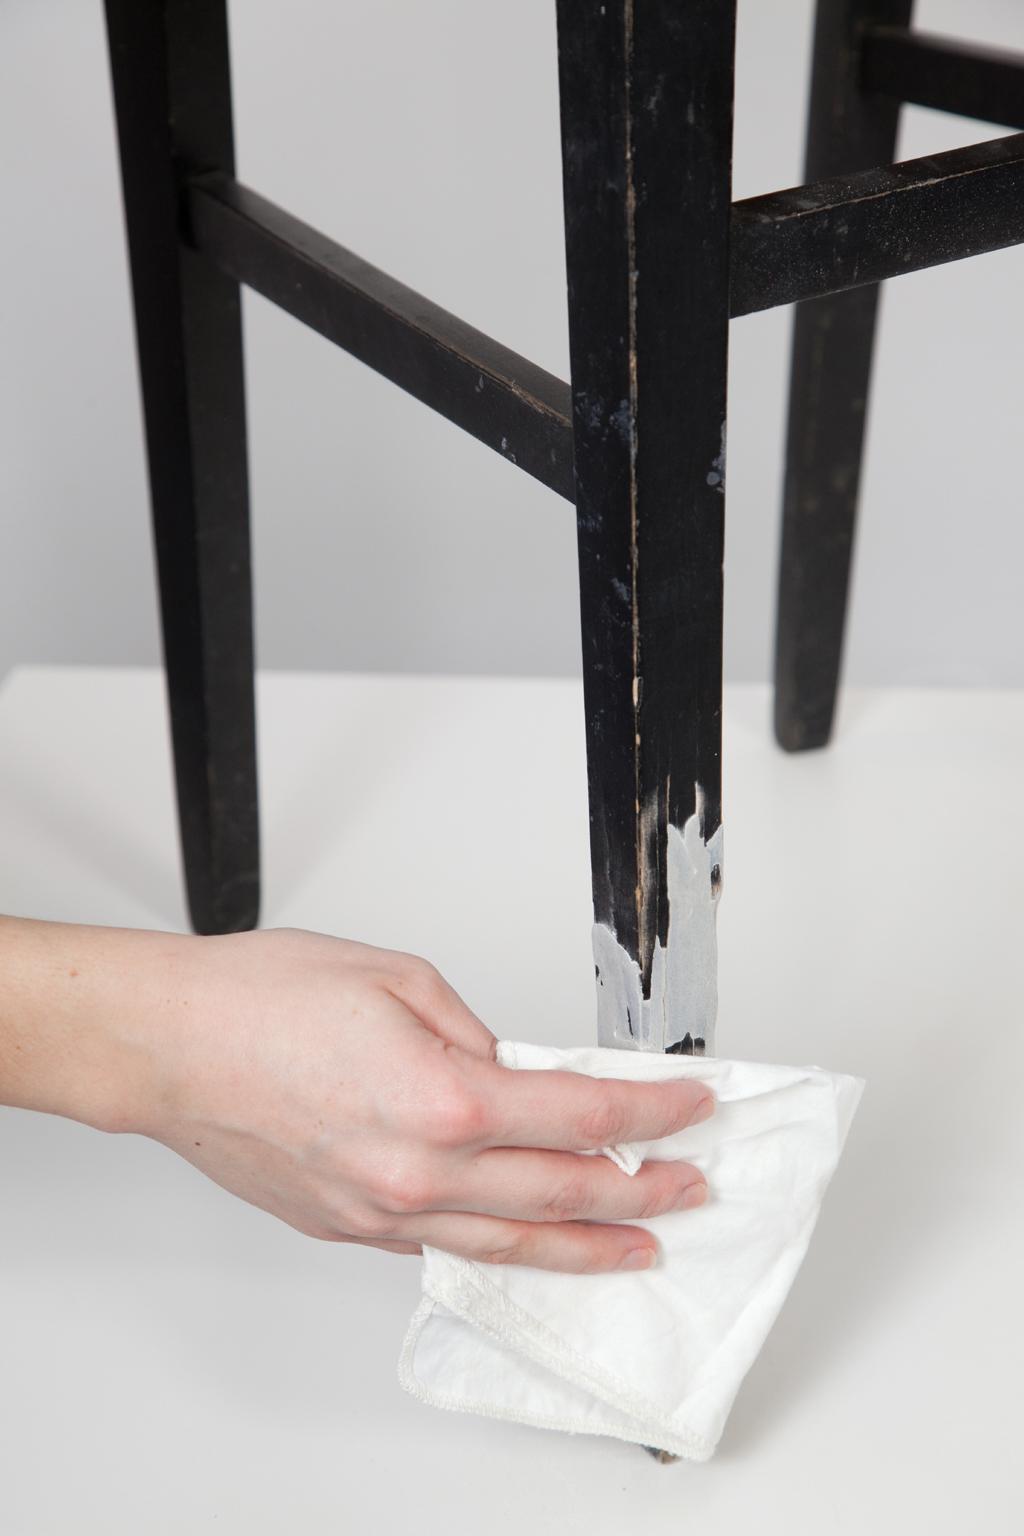 Reparer le pied d'une chaise cassee